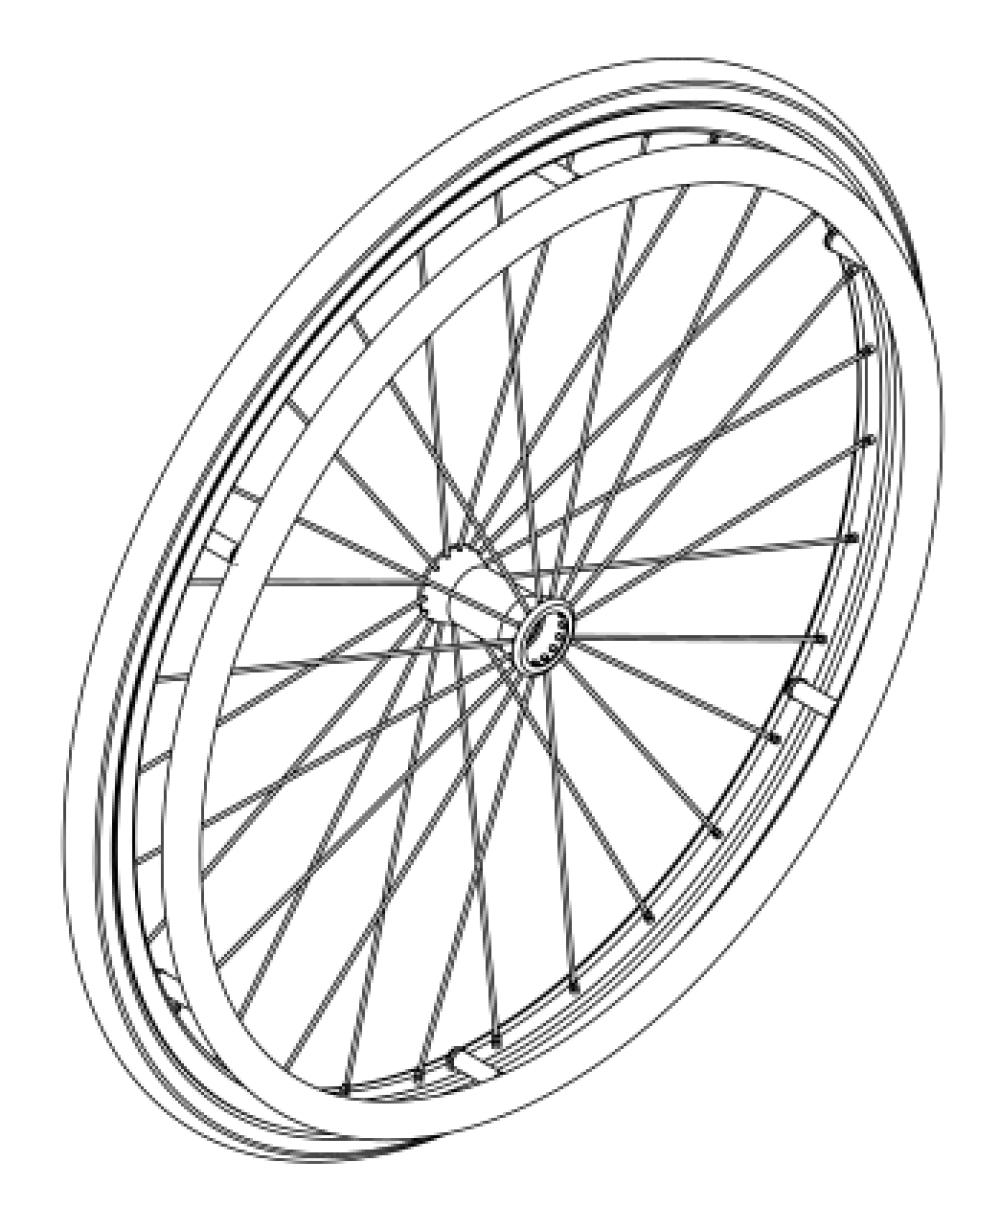 (discontinued) Spark Spoke Wheel / Tire / Handrim Kits parts diagram